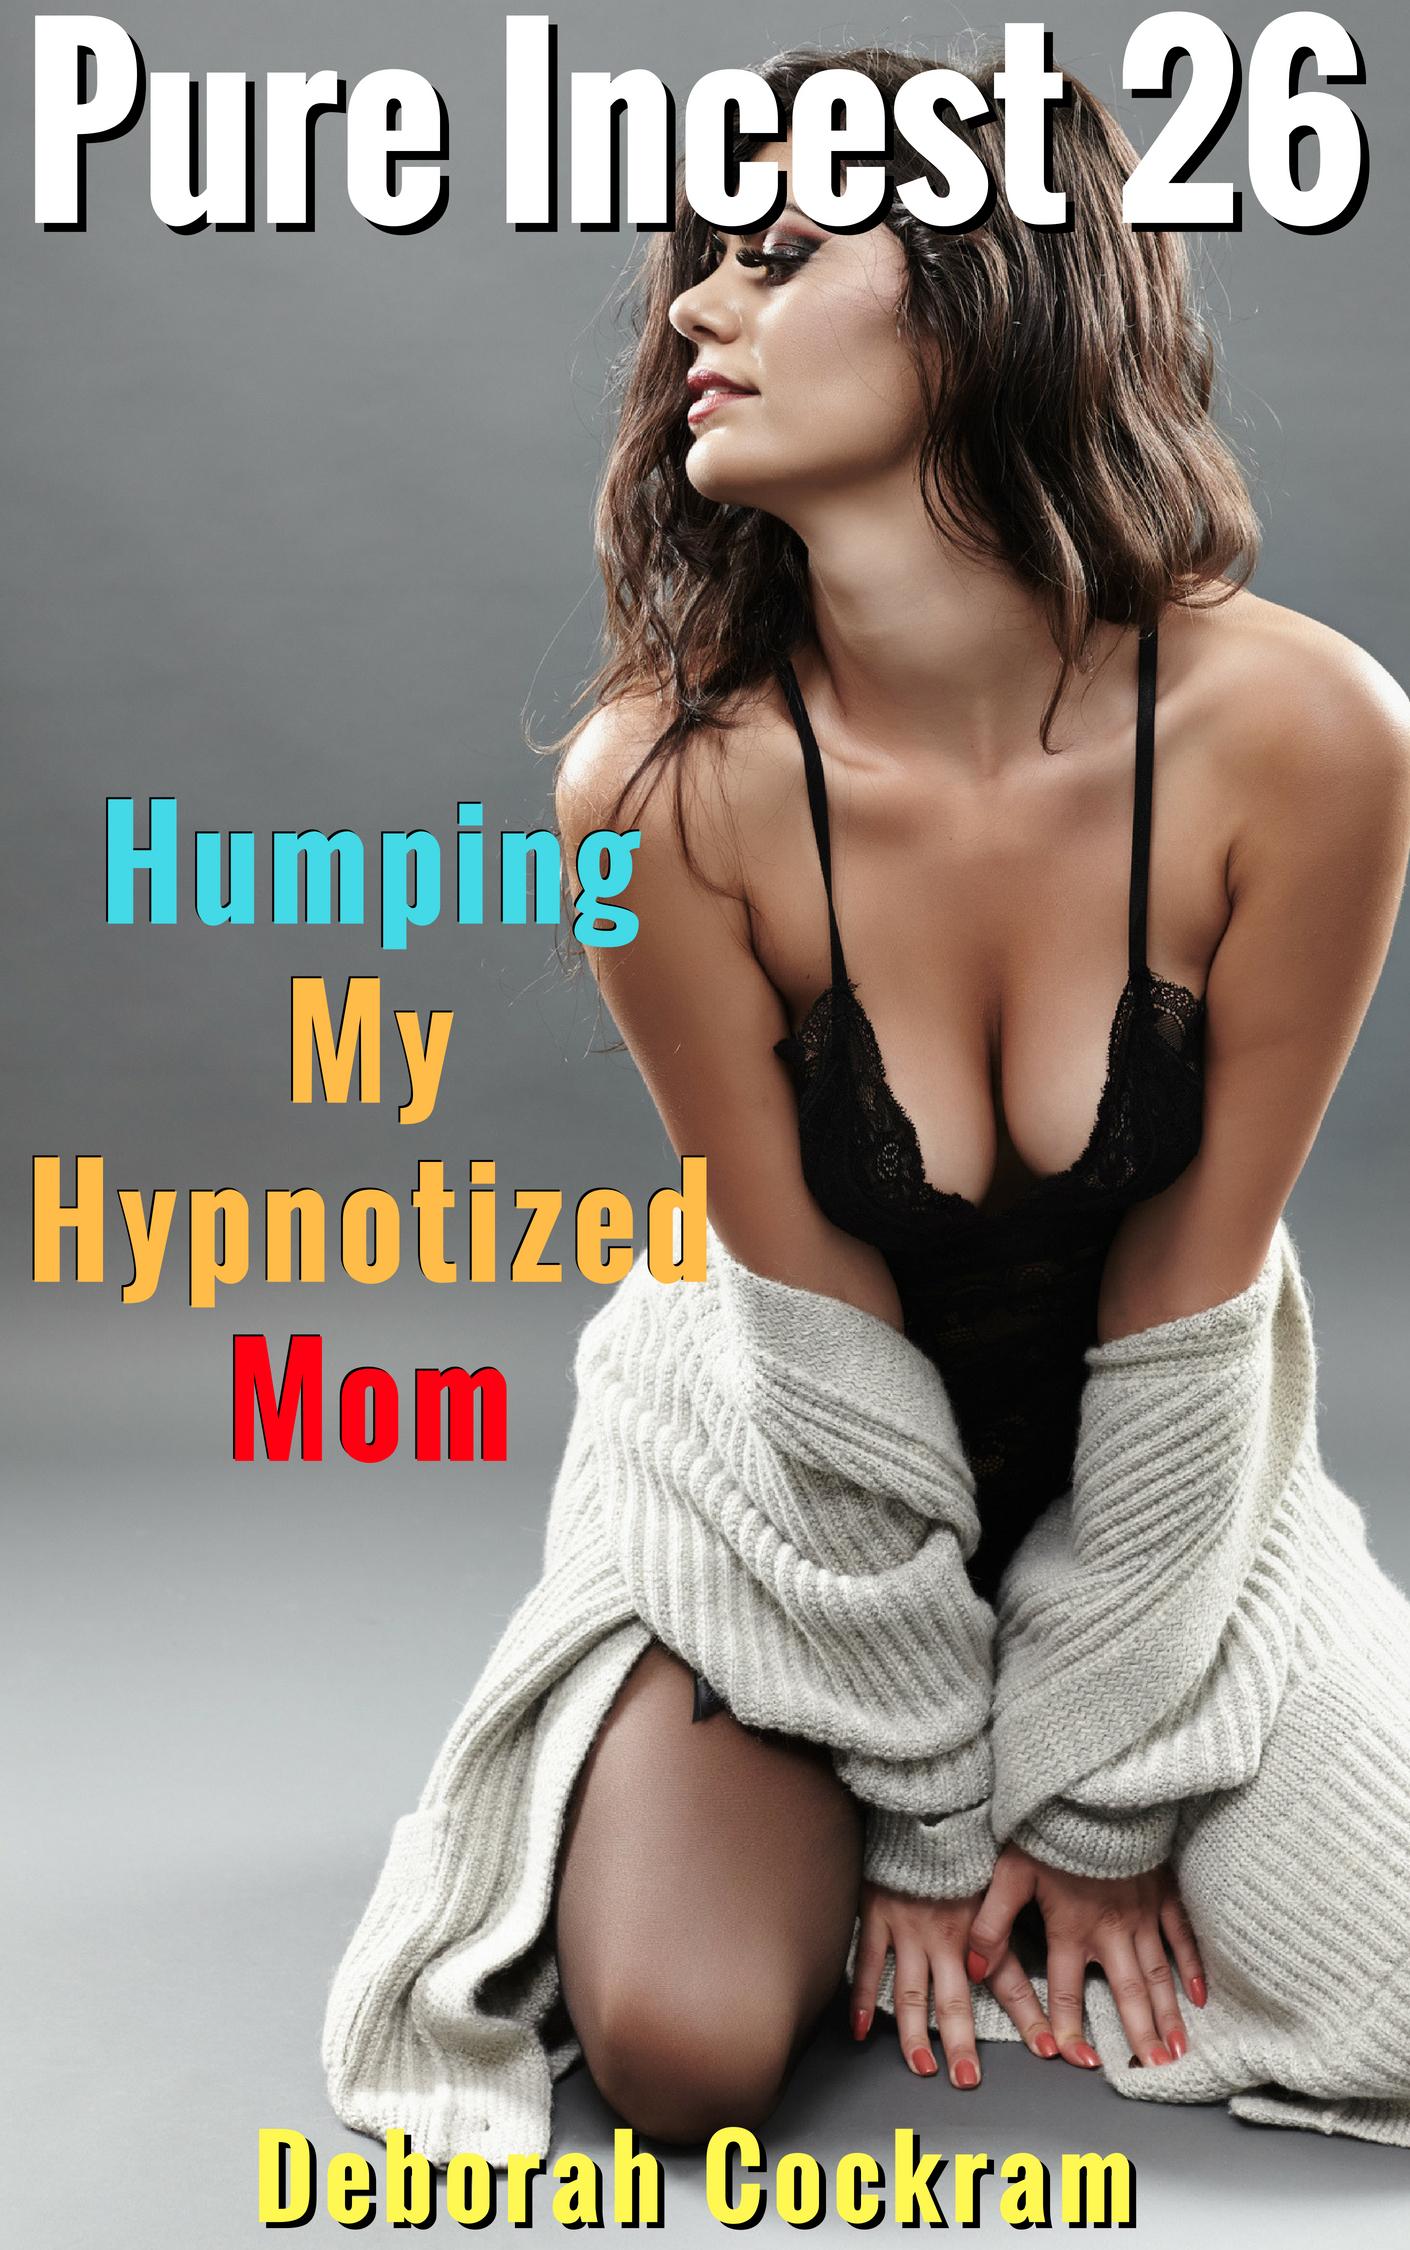 Hypnosis/sex stories/incest